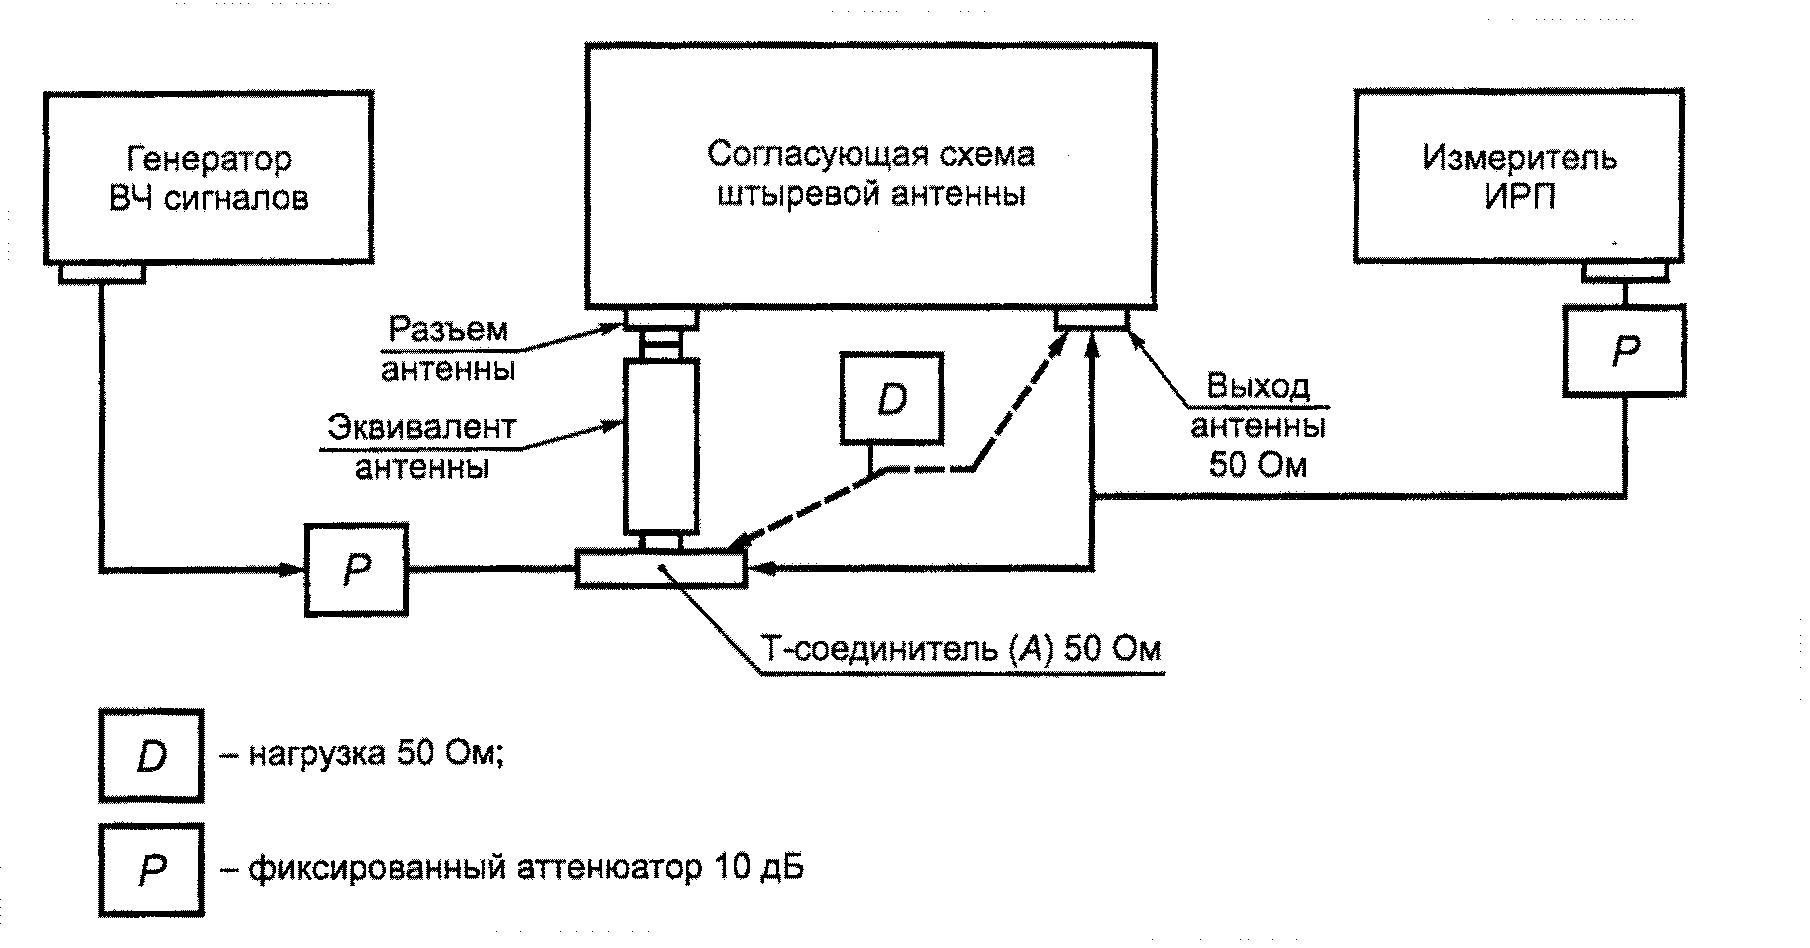 анализатор архитек 2000 инструкция